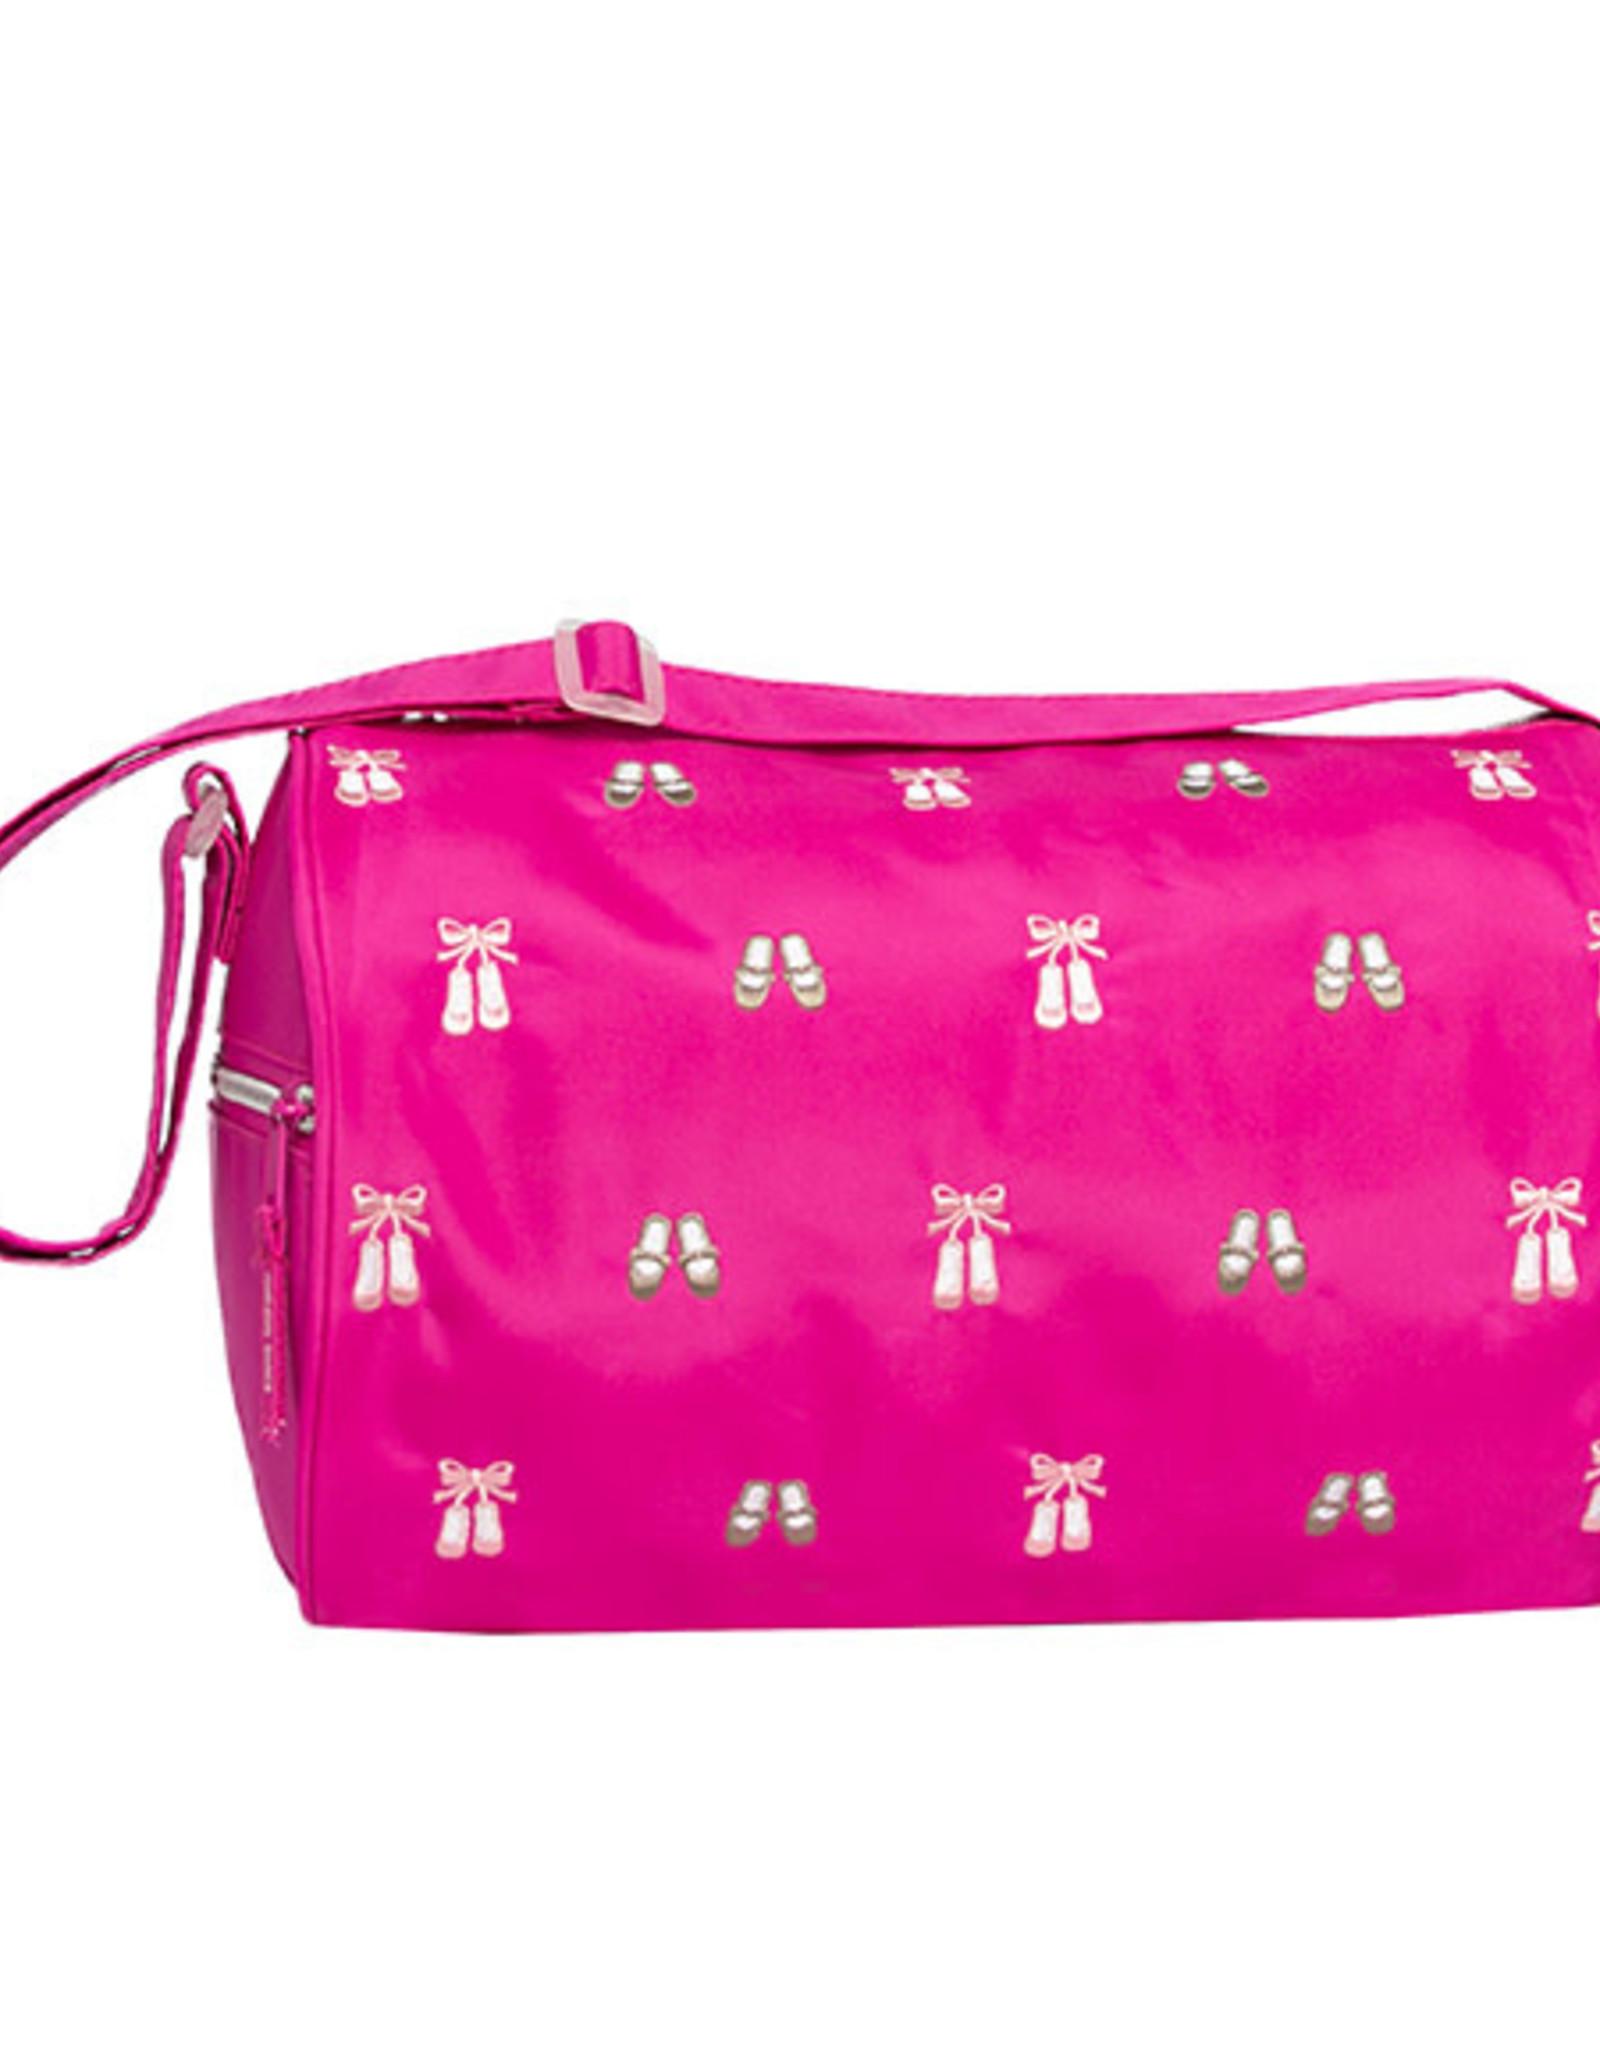 Horizon 5603 Daisy Duffel- Pink